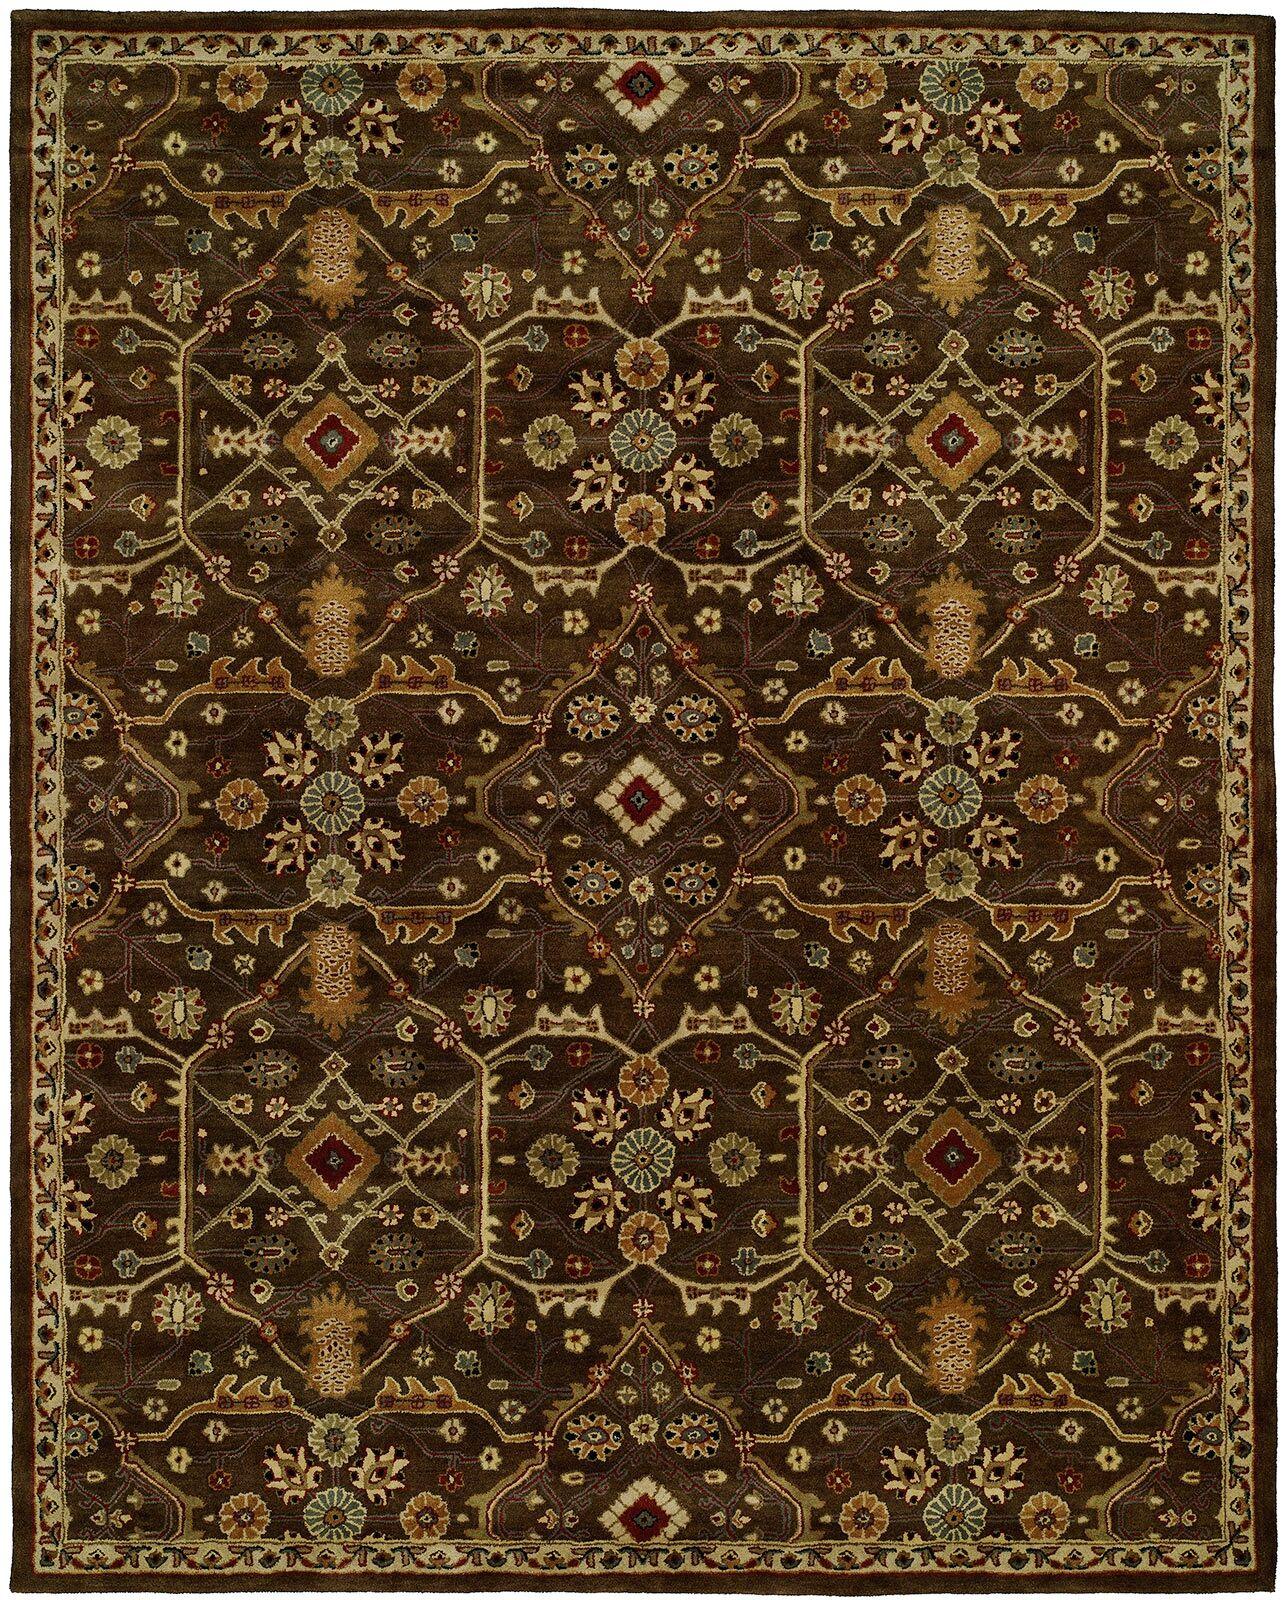 Borah Hand-Woven Brown Area Rug Rug Size: Rectangle 9' x 12'